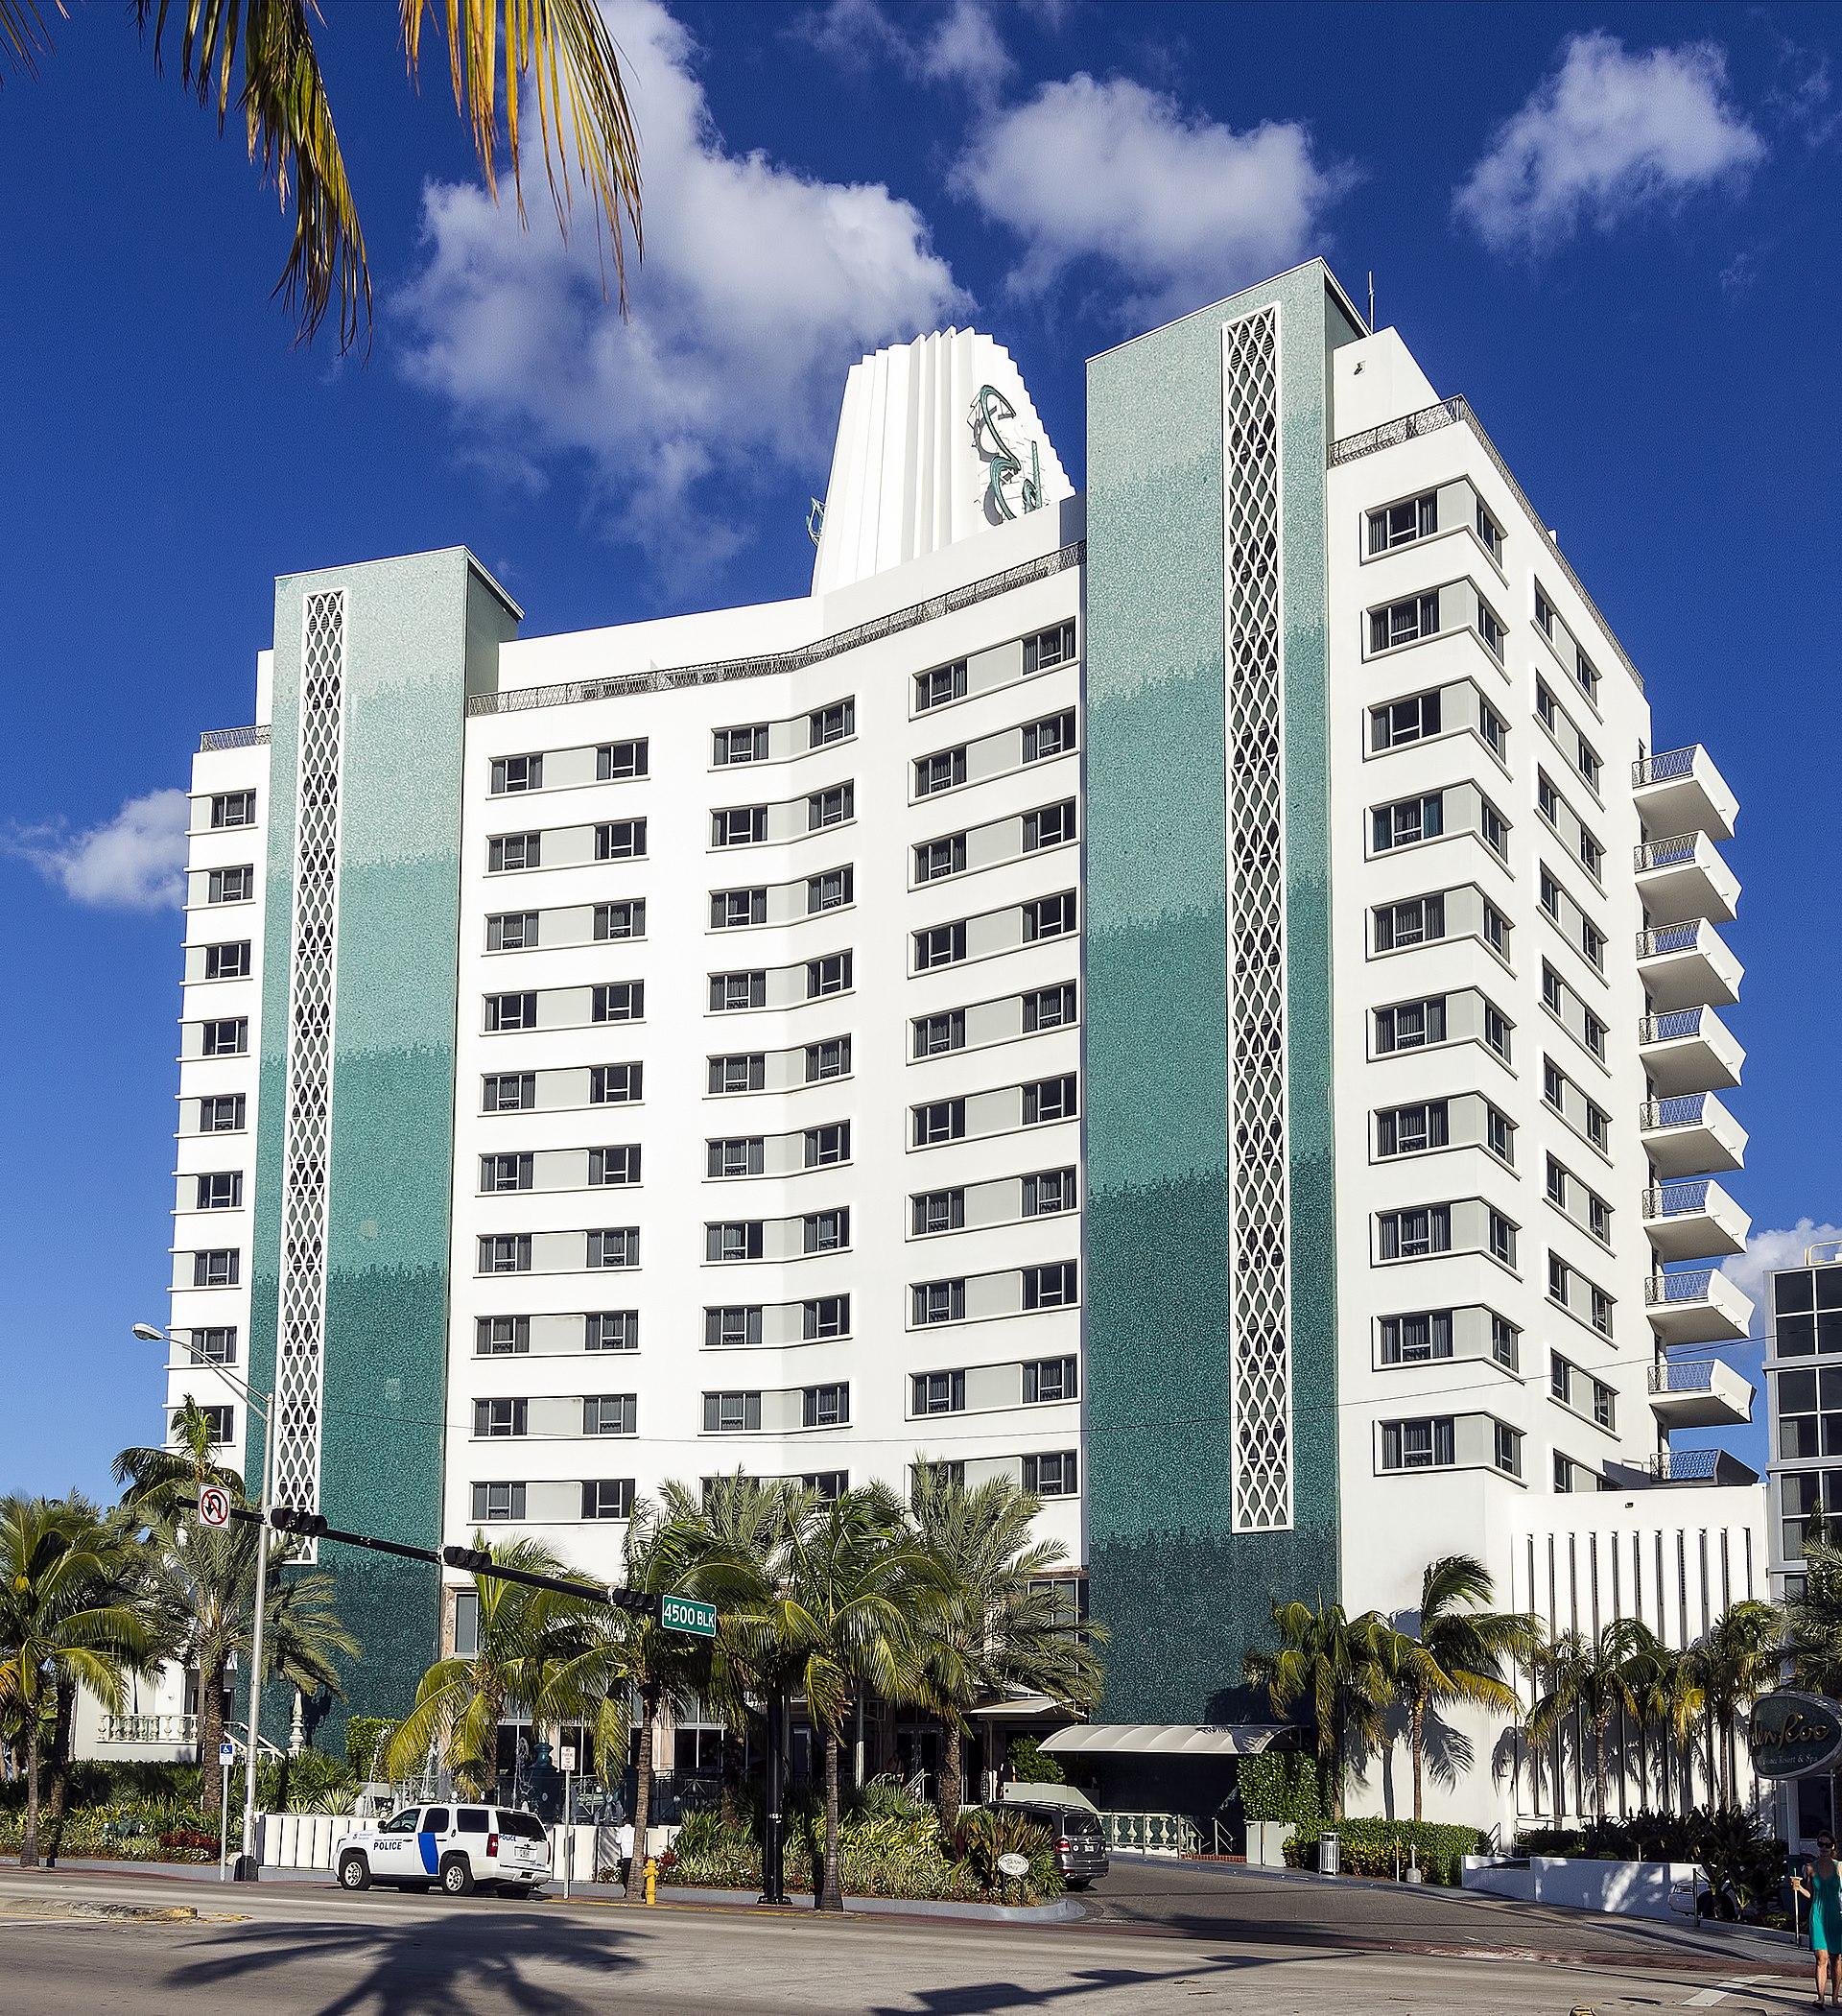 Eden Resort Suites: Eden Roc Miami Beach Hotel